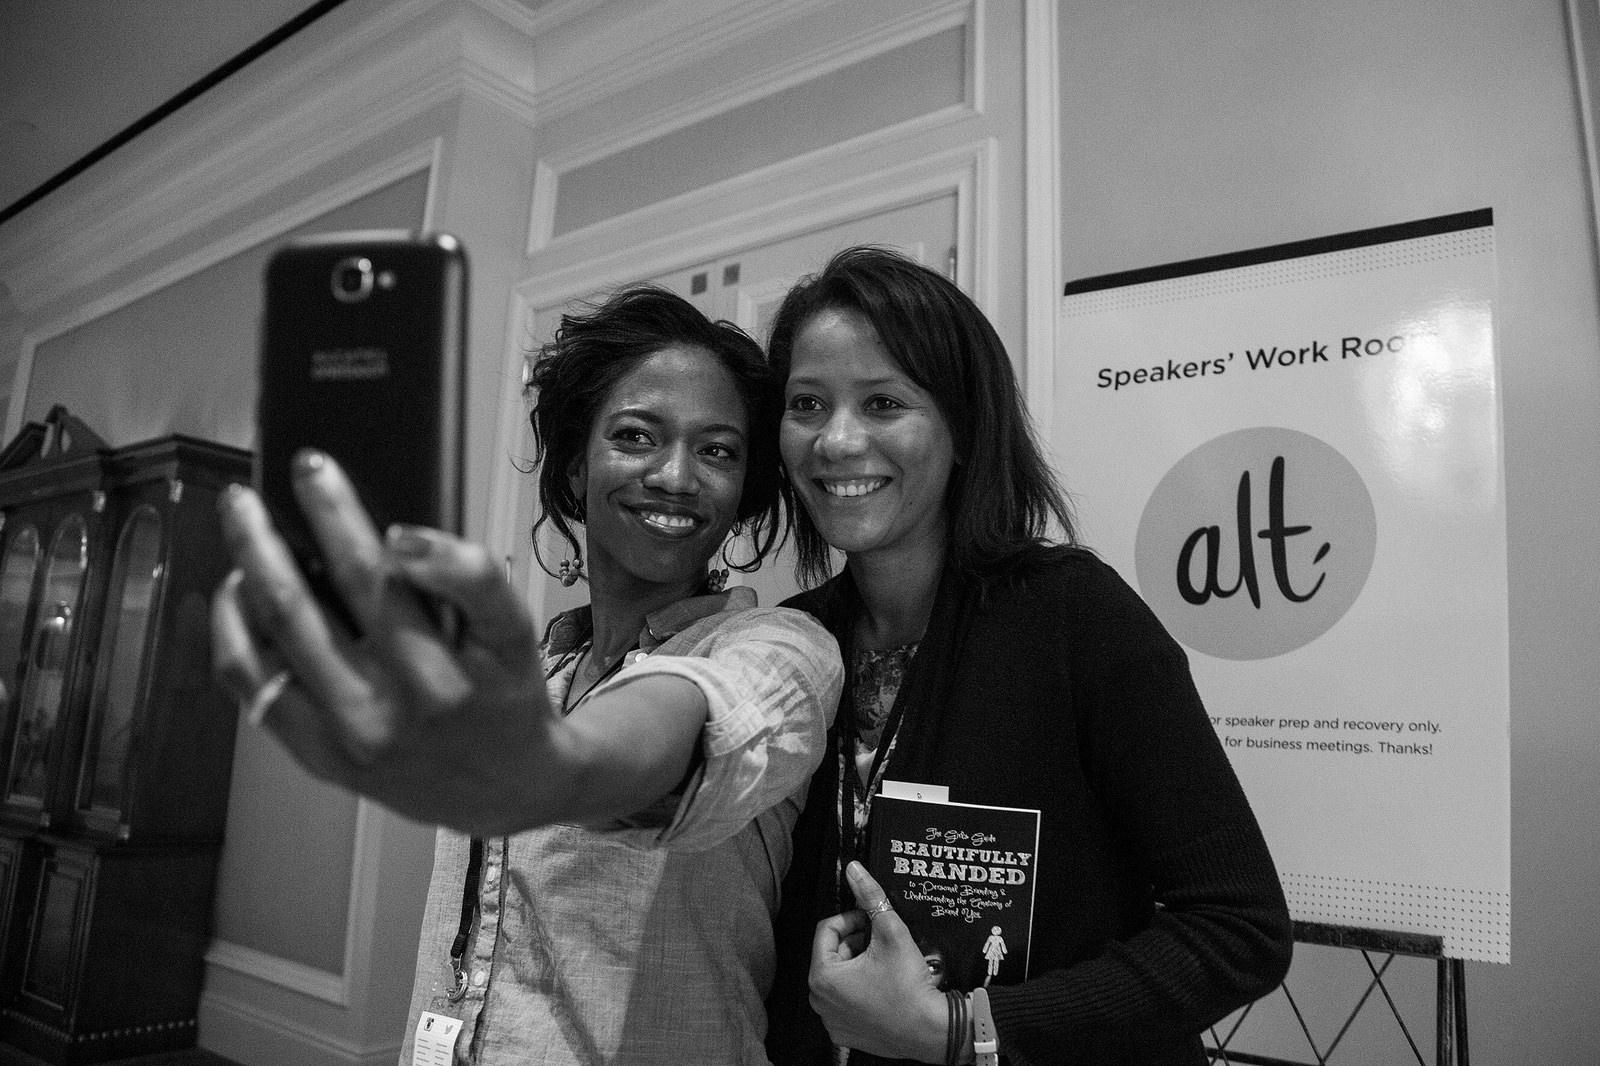 Alt Summit Summer 2015 - Speaker, sewpreneur and Author of Beautifully Branded Olivia Omega